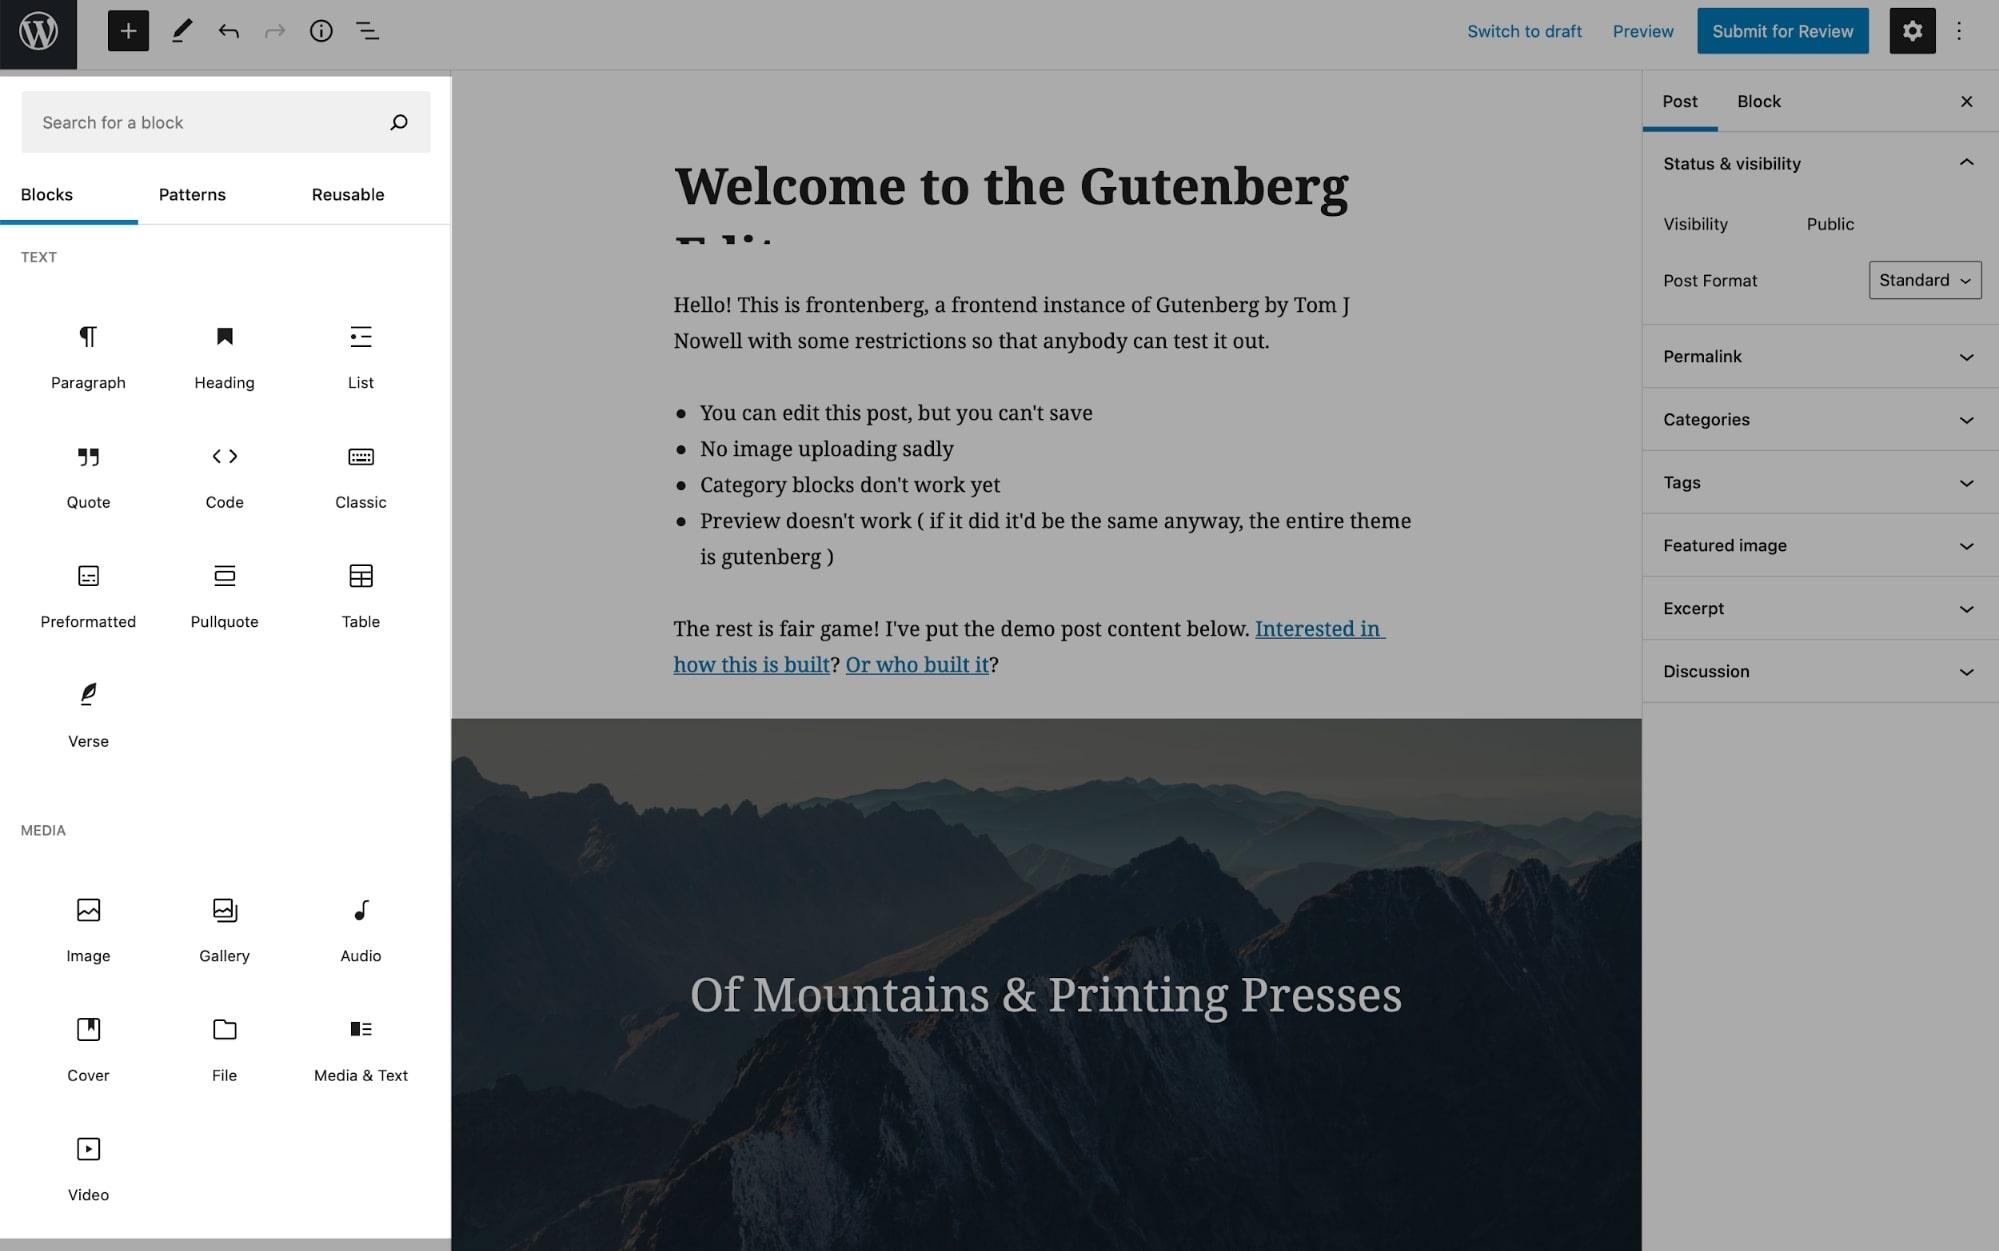 Blocks in the Gutenberg editor